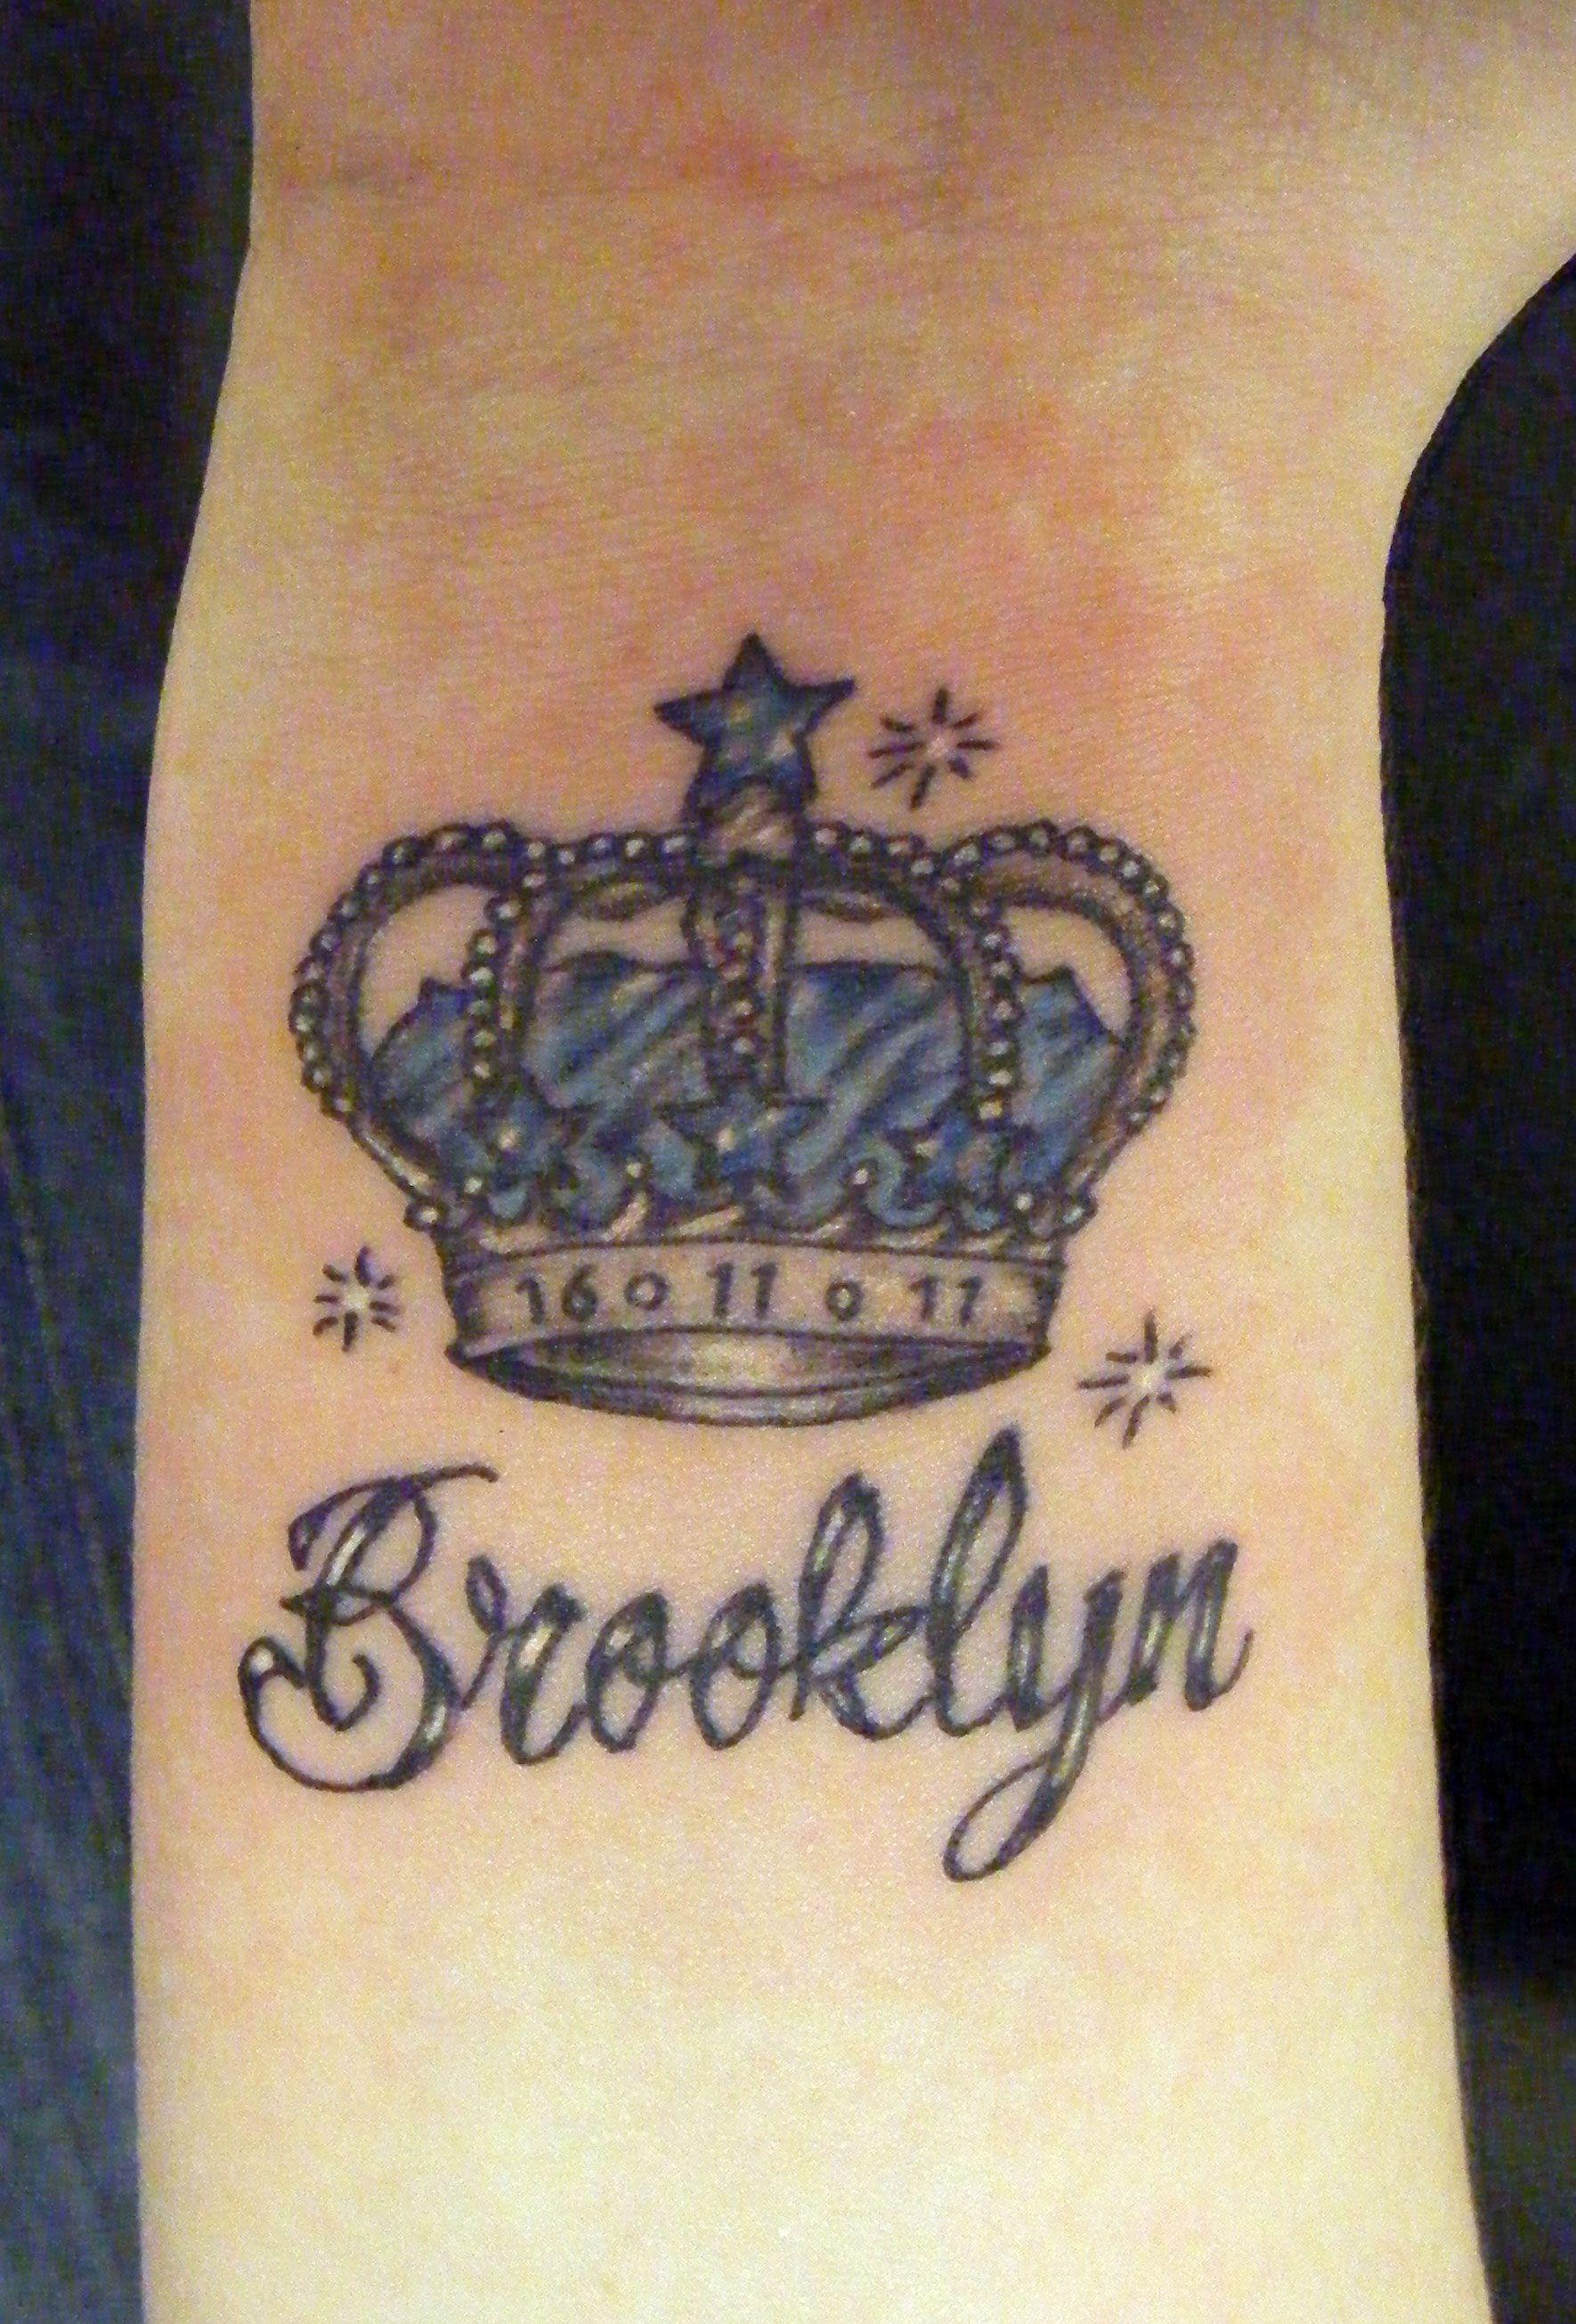 Memorial brooklyn crown tattoo on wrist crown tattoo for Brooklyn tattoo ideas